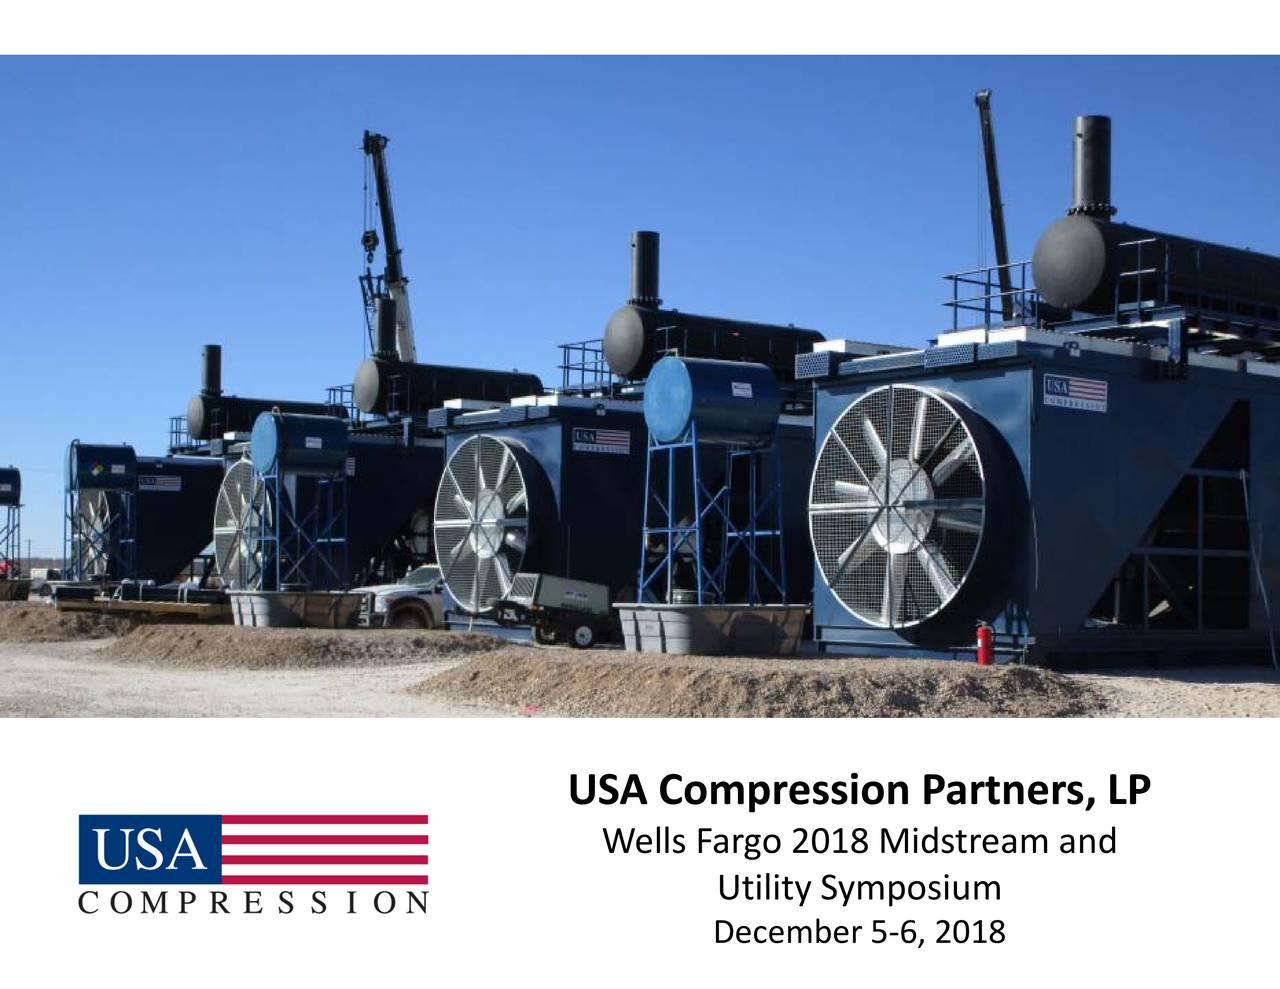 Wells Fargo 2018 Midstream and USA Compression Partners, LP